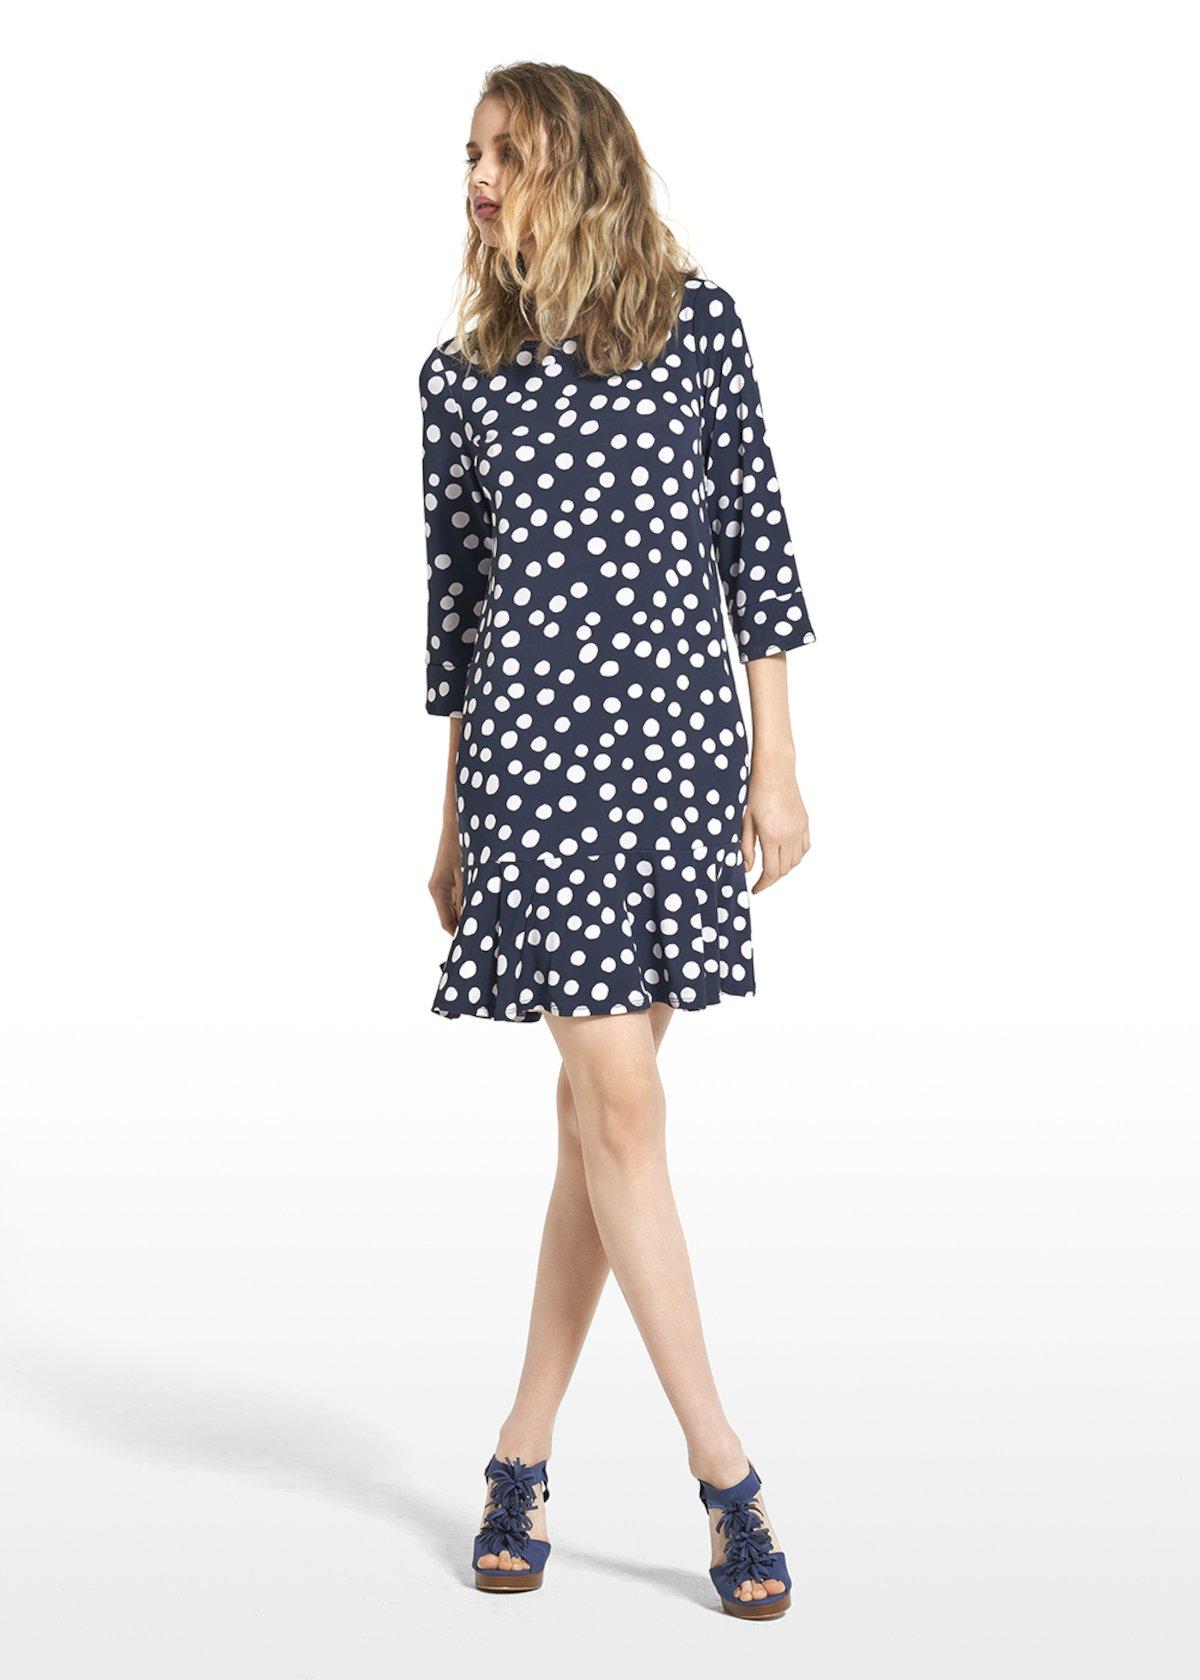 Dress Alois with polka dot pattern - Medium Blue / White Pois - Woman - Category image